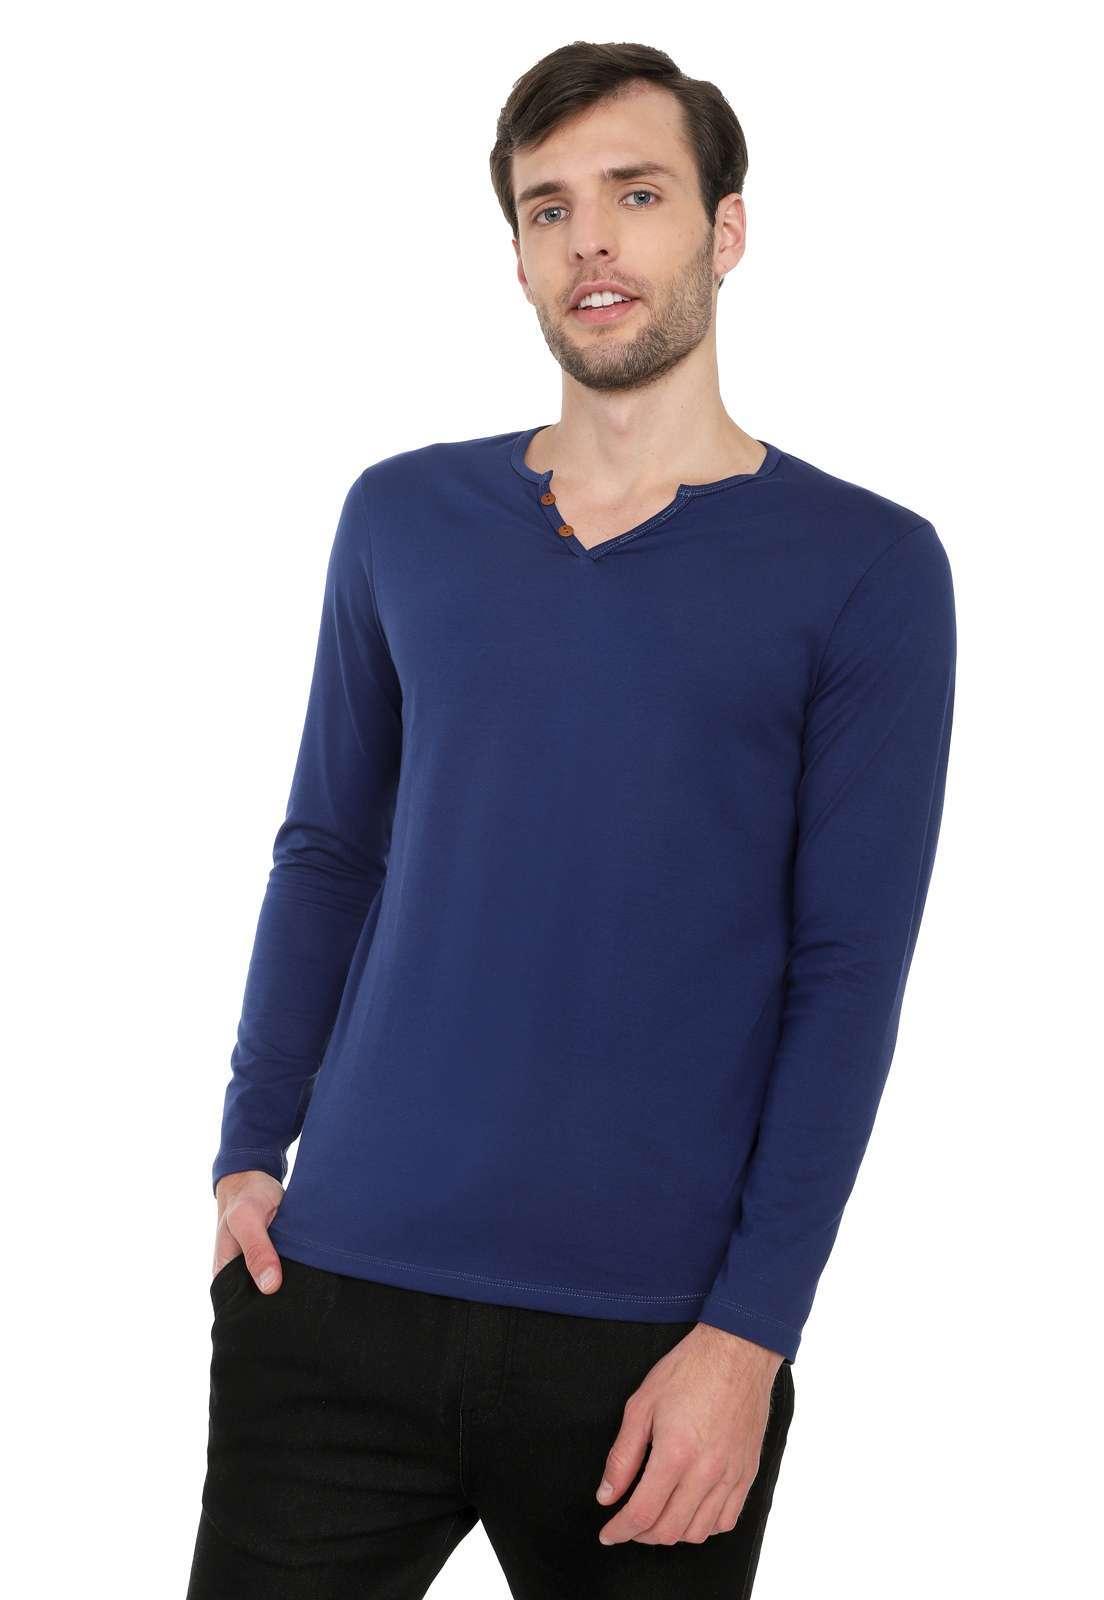 Camiseta Manga Larga Licrada - Azul Oscuro | Polovers